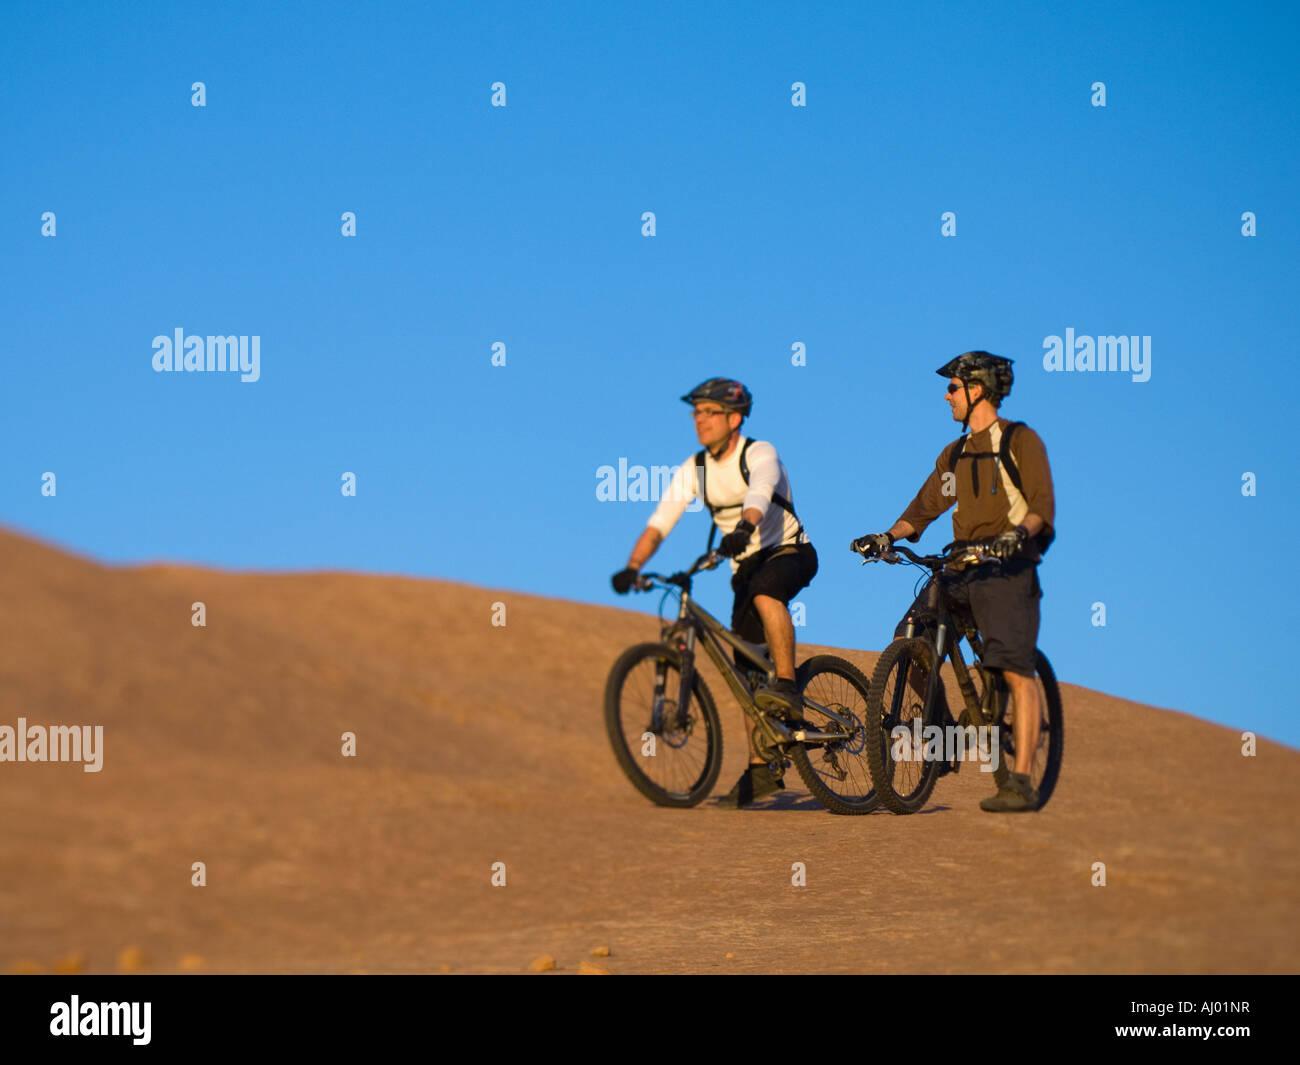 People riding mountain bikes - Stock Image